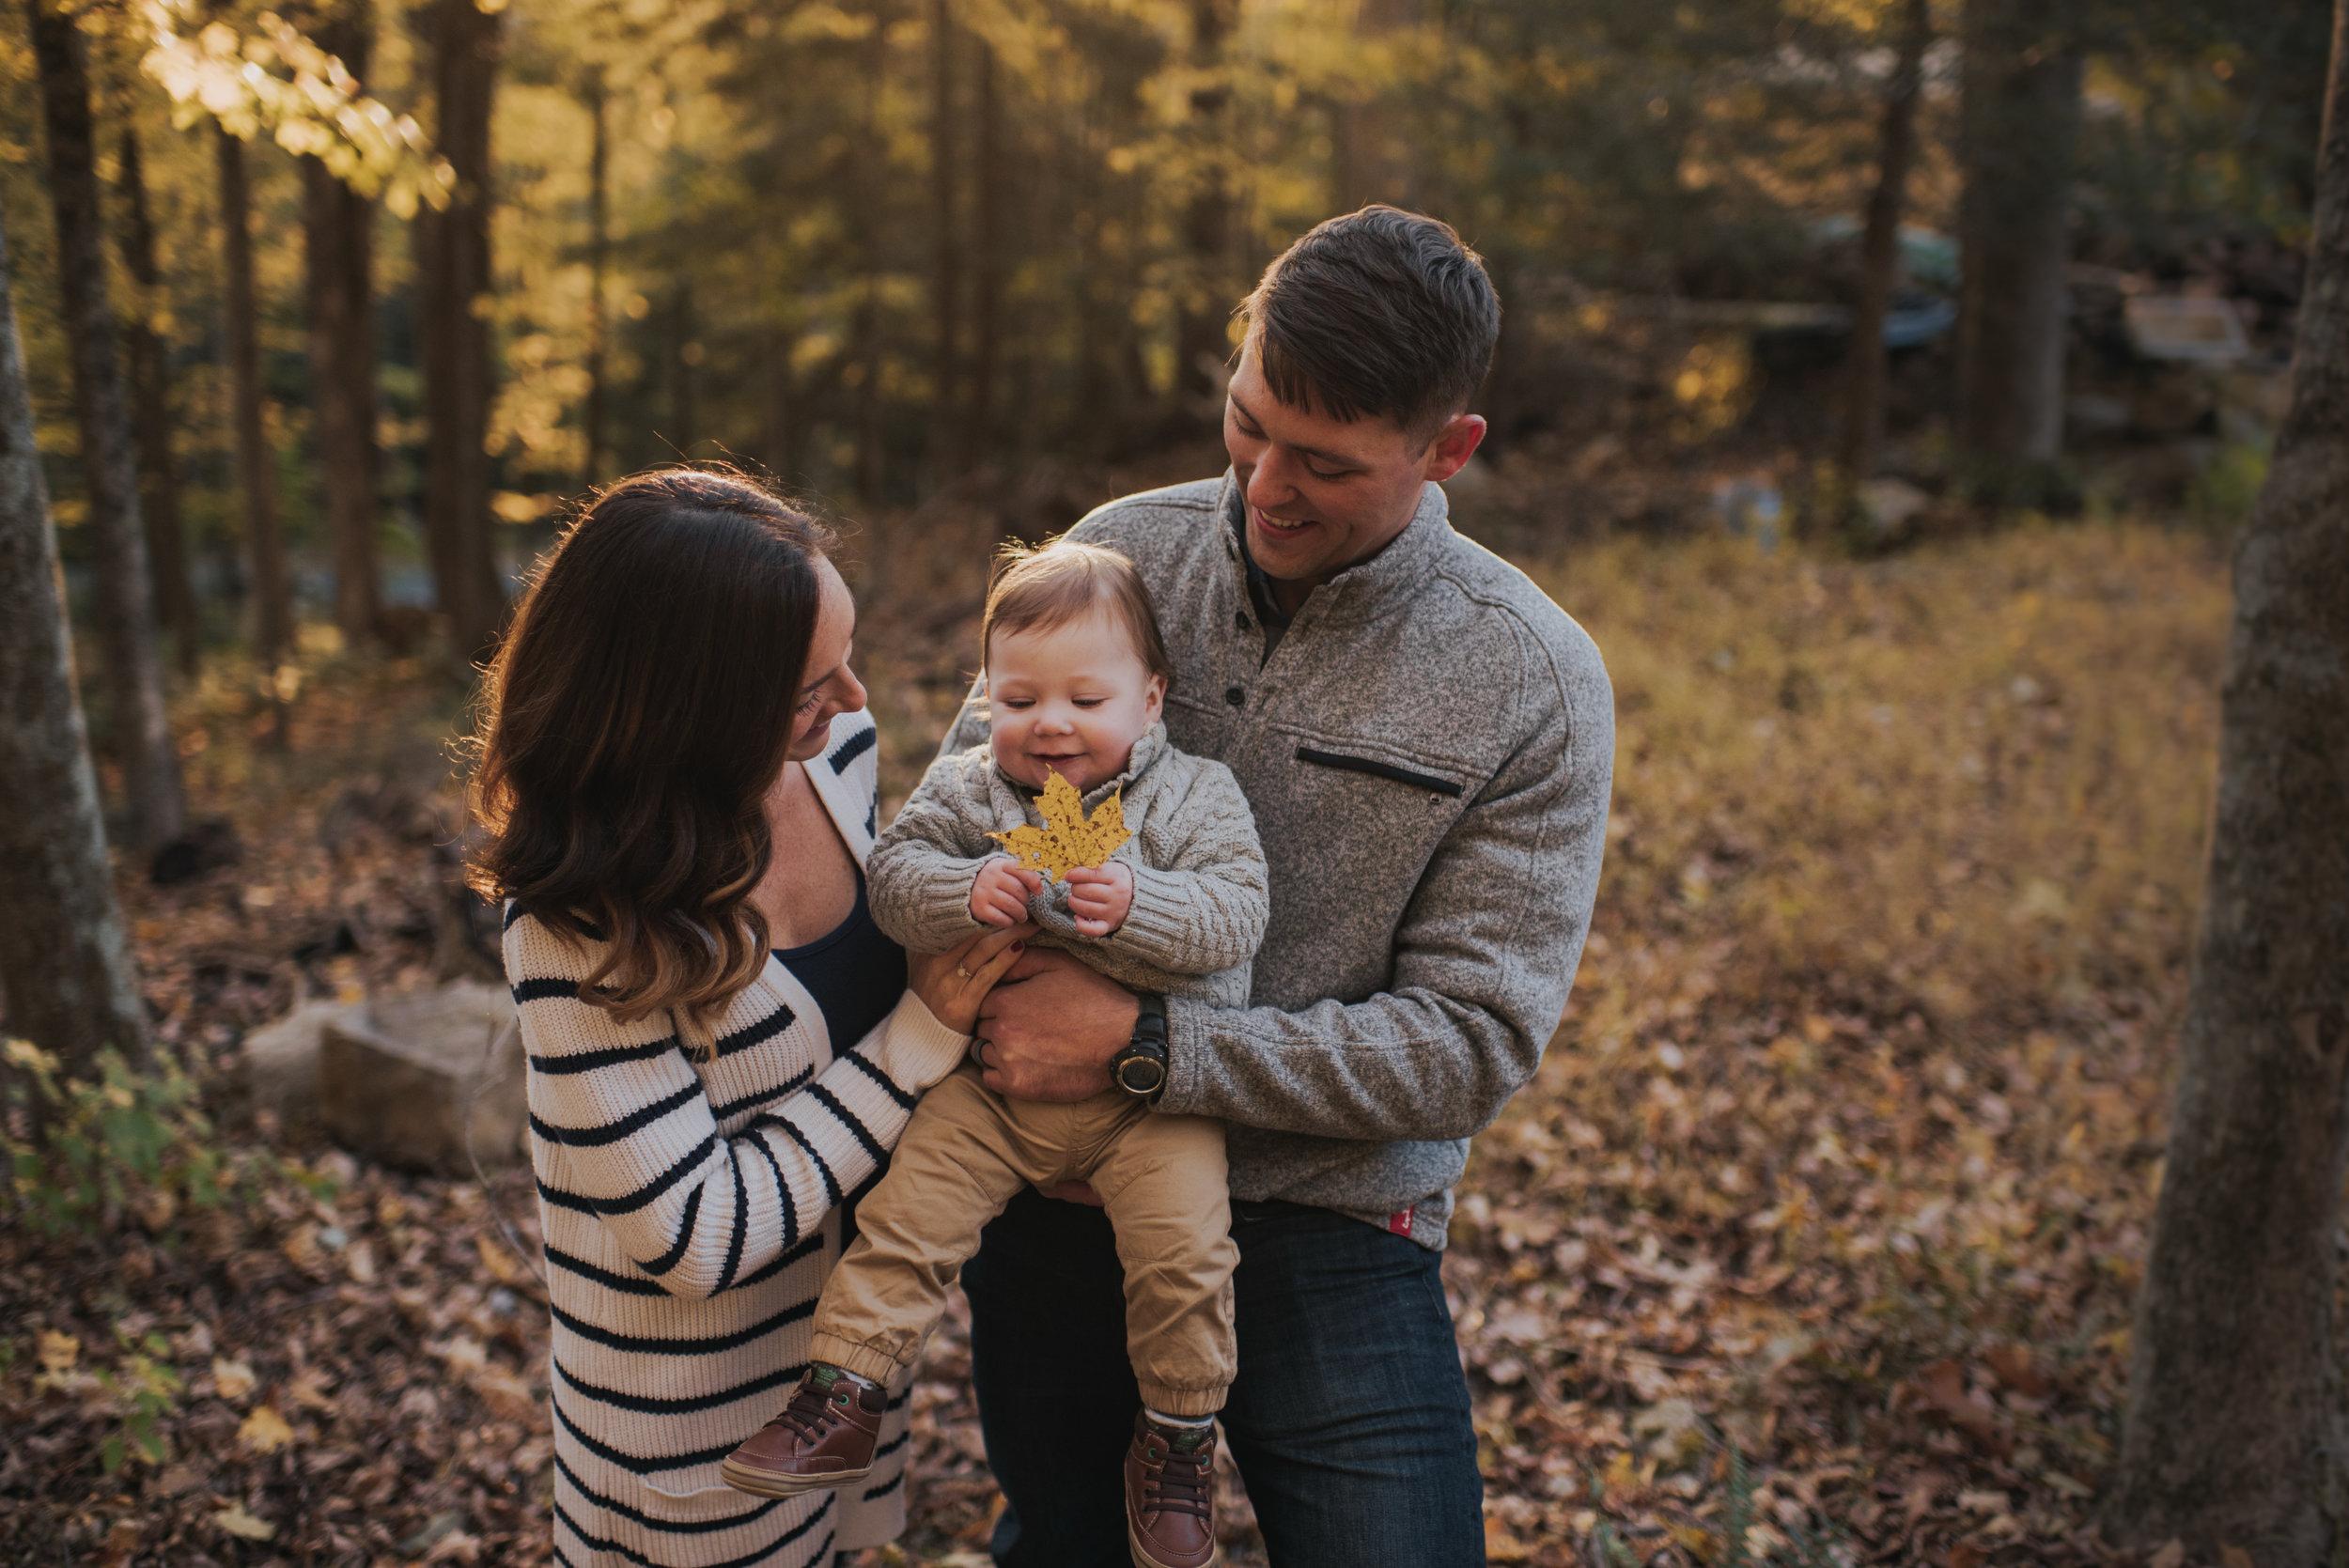 newtownctnewborn/familyphotographerkendraconroyphotography